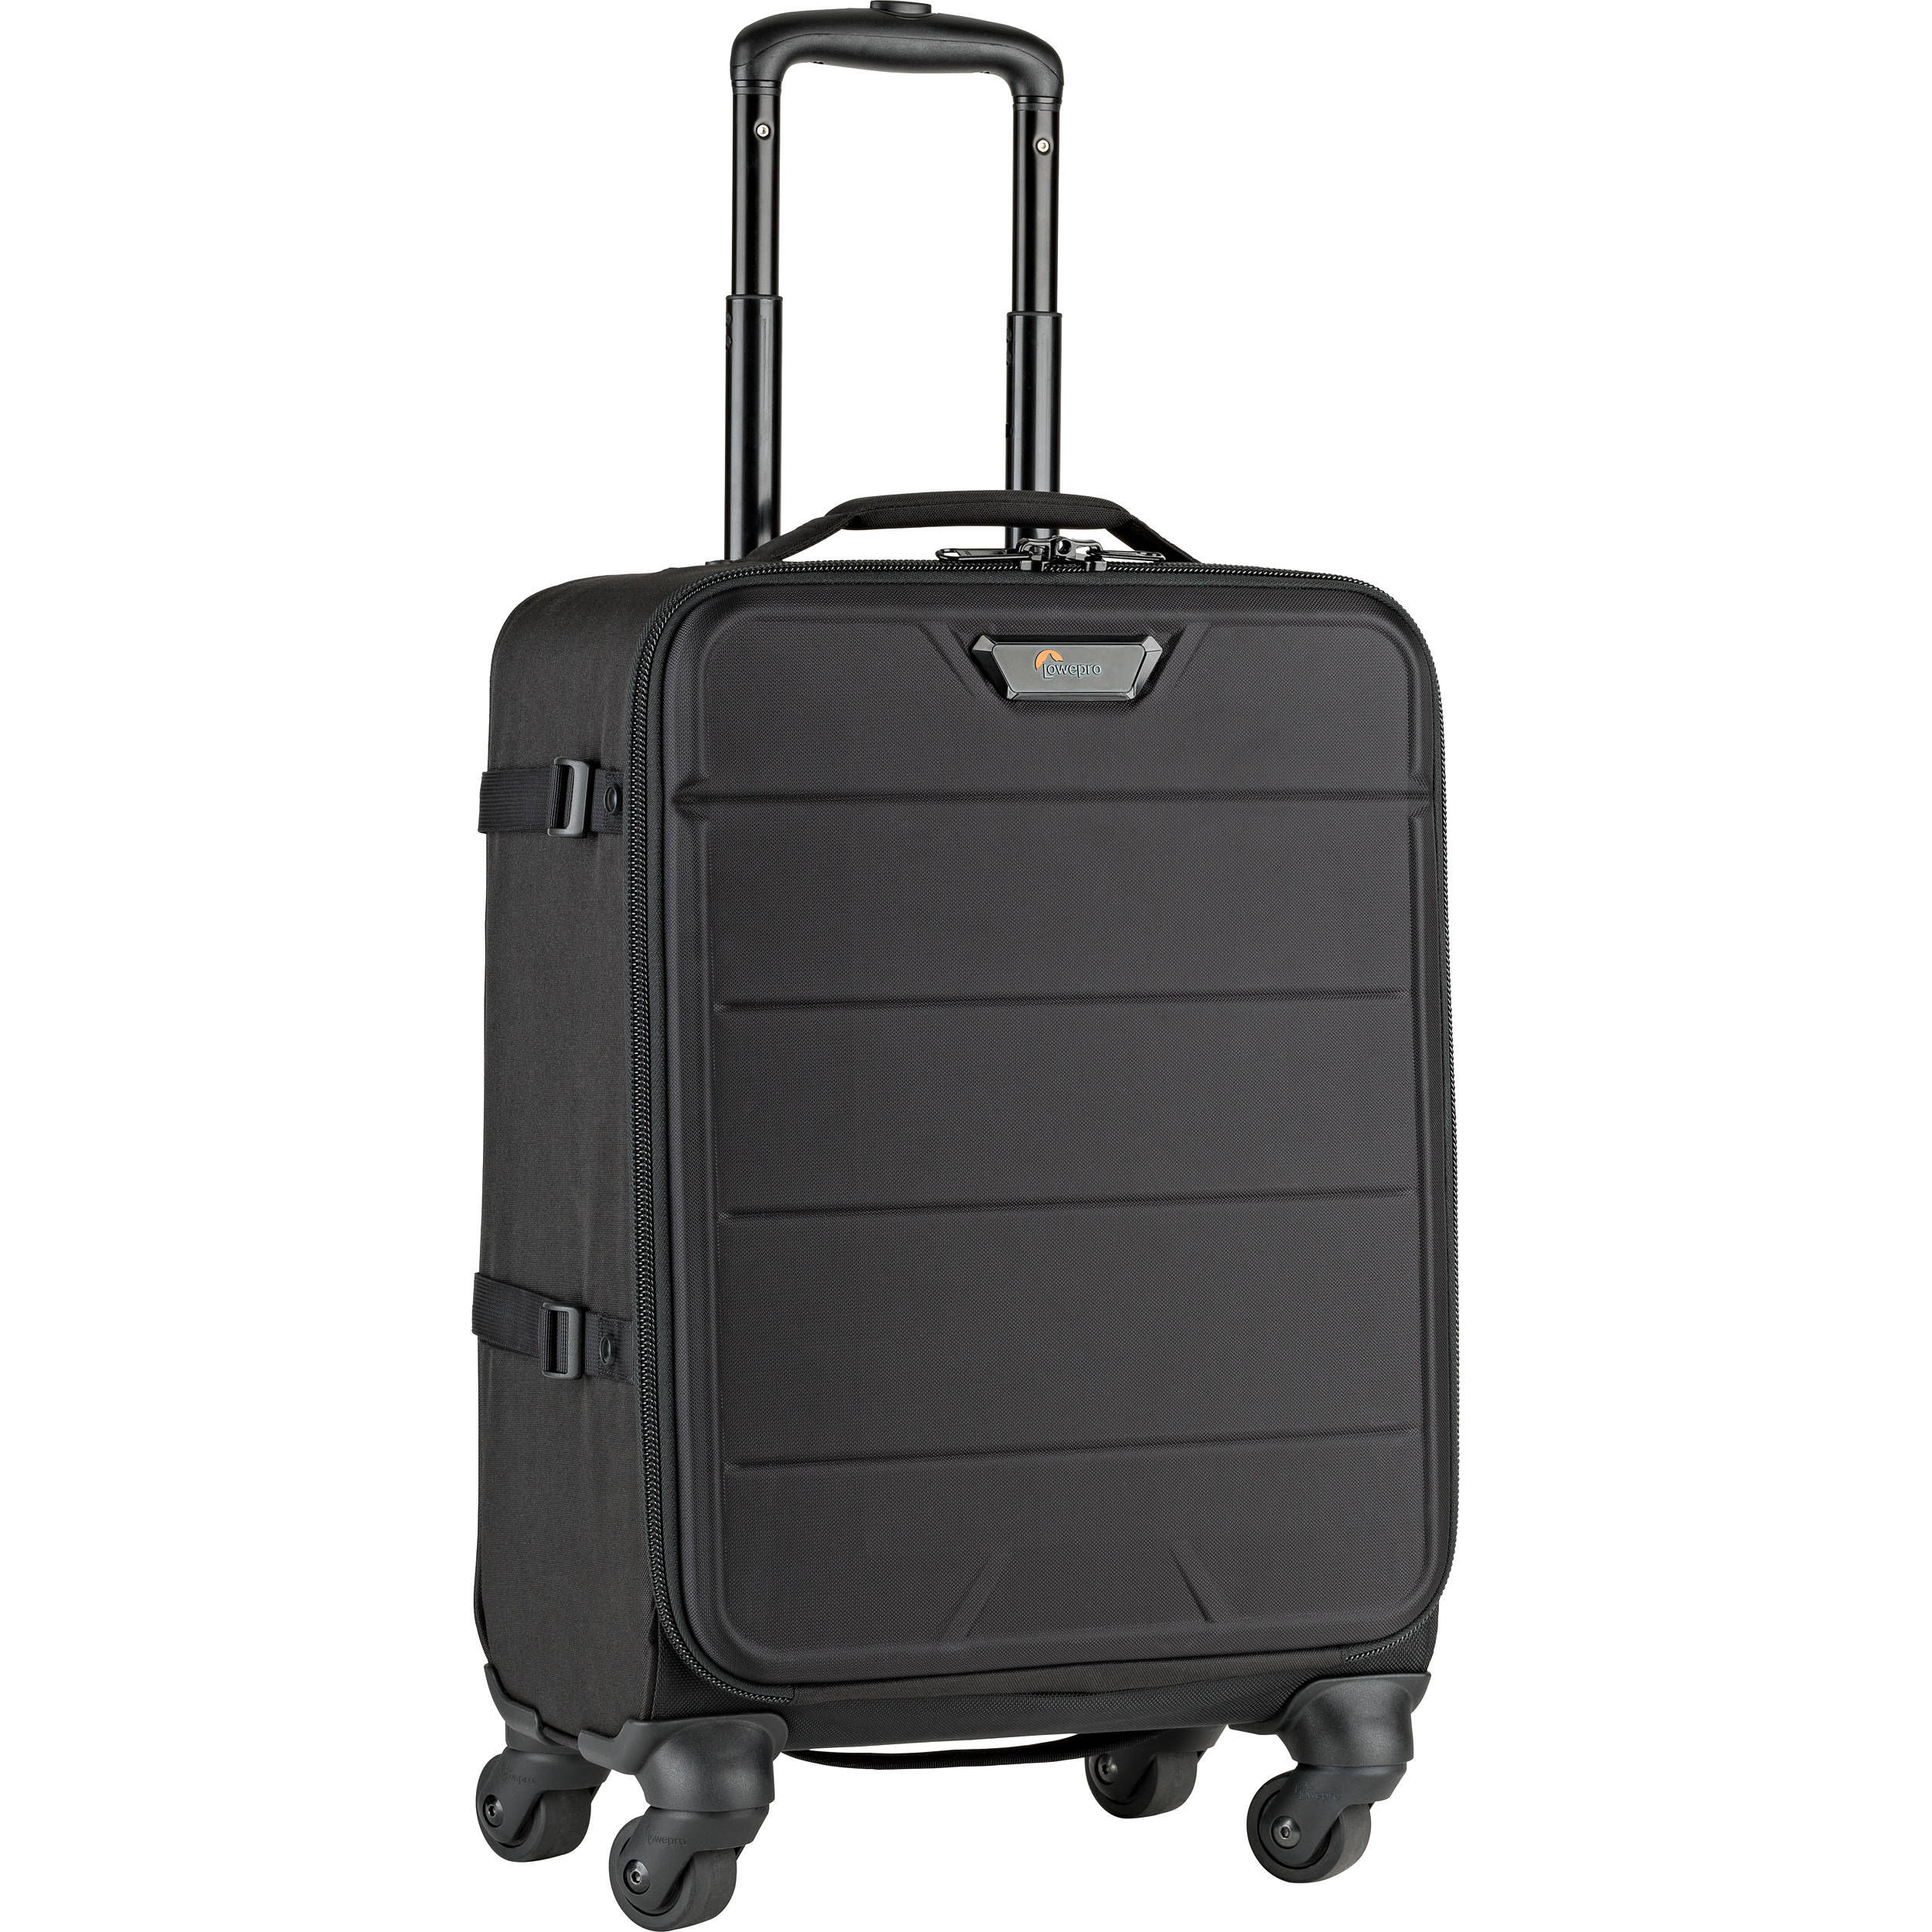 Lowepro Photostream Sp 200 Roller Bag Black